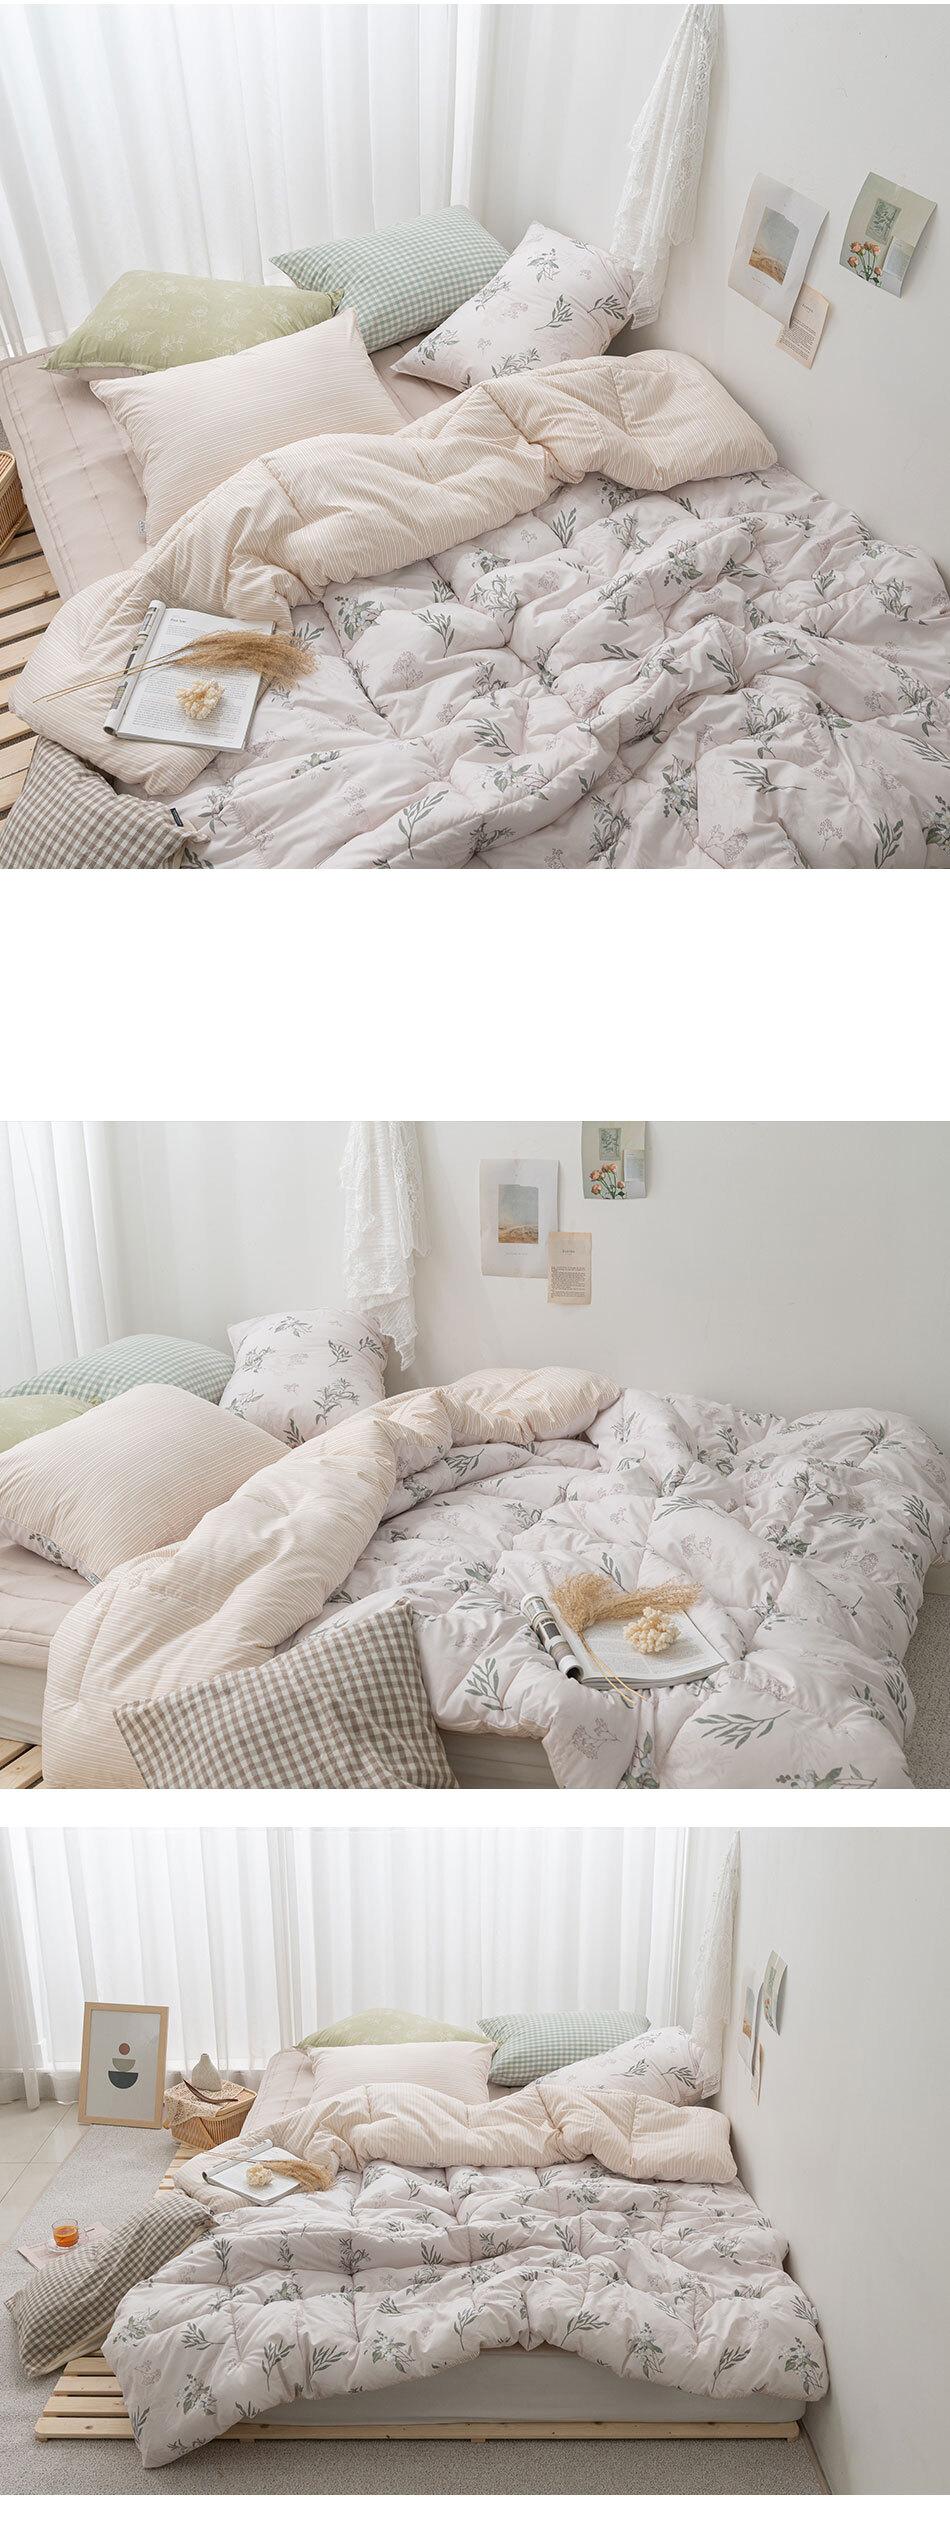 bailey_bed_03.jpg